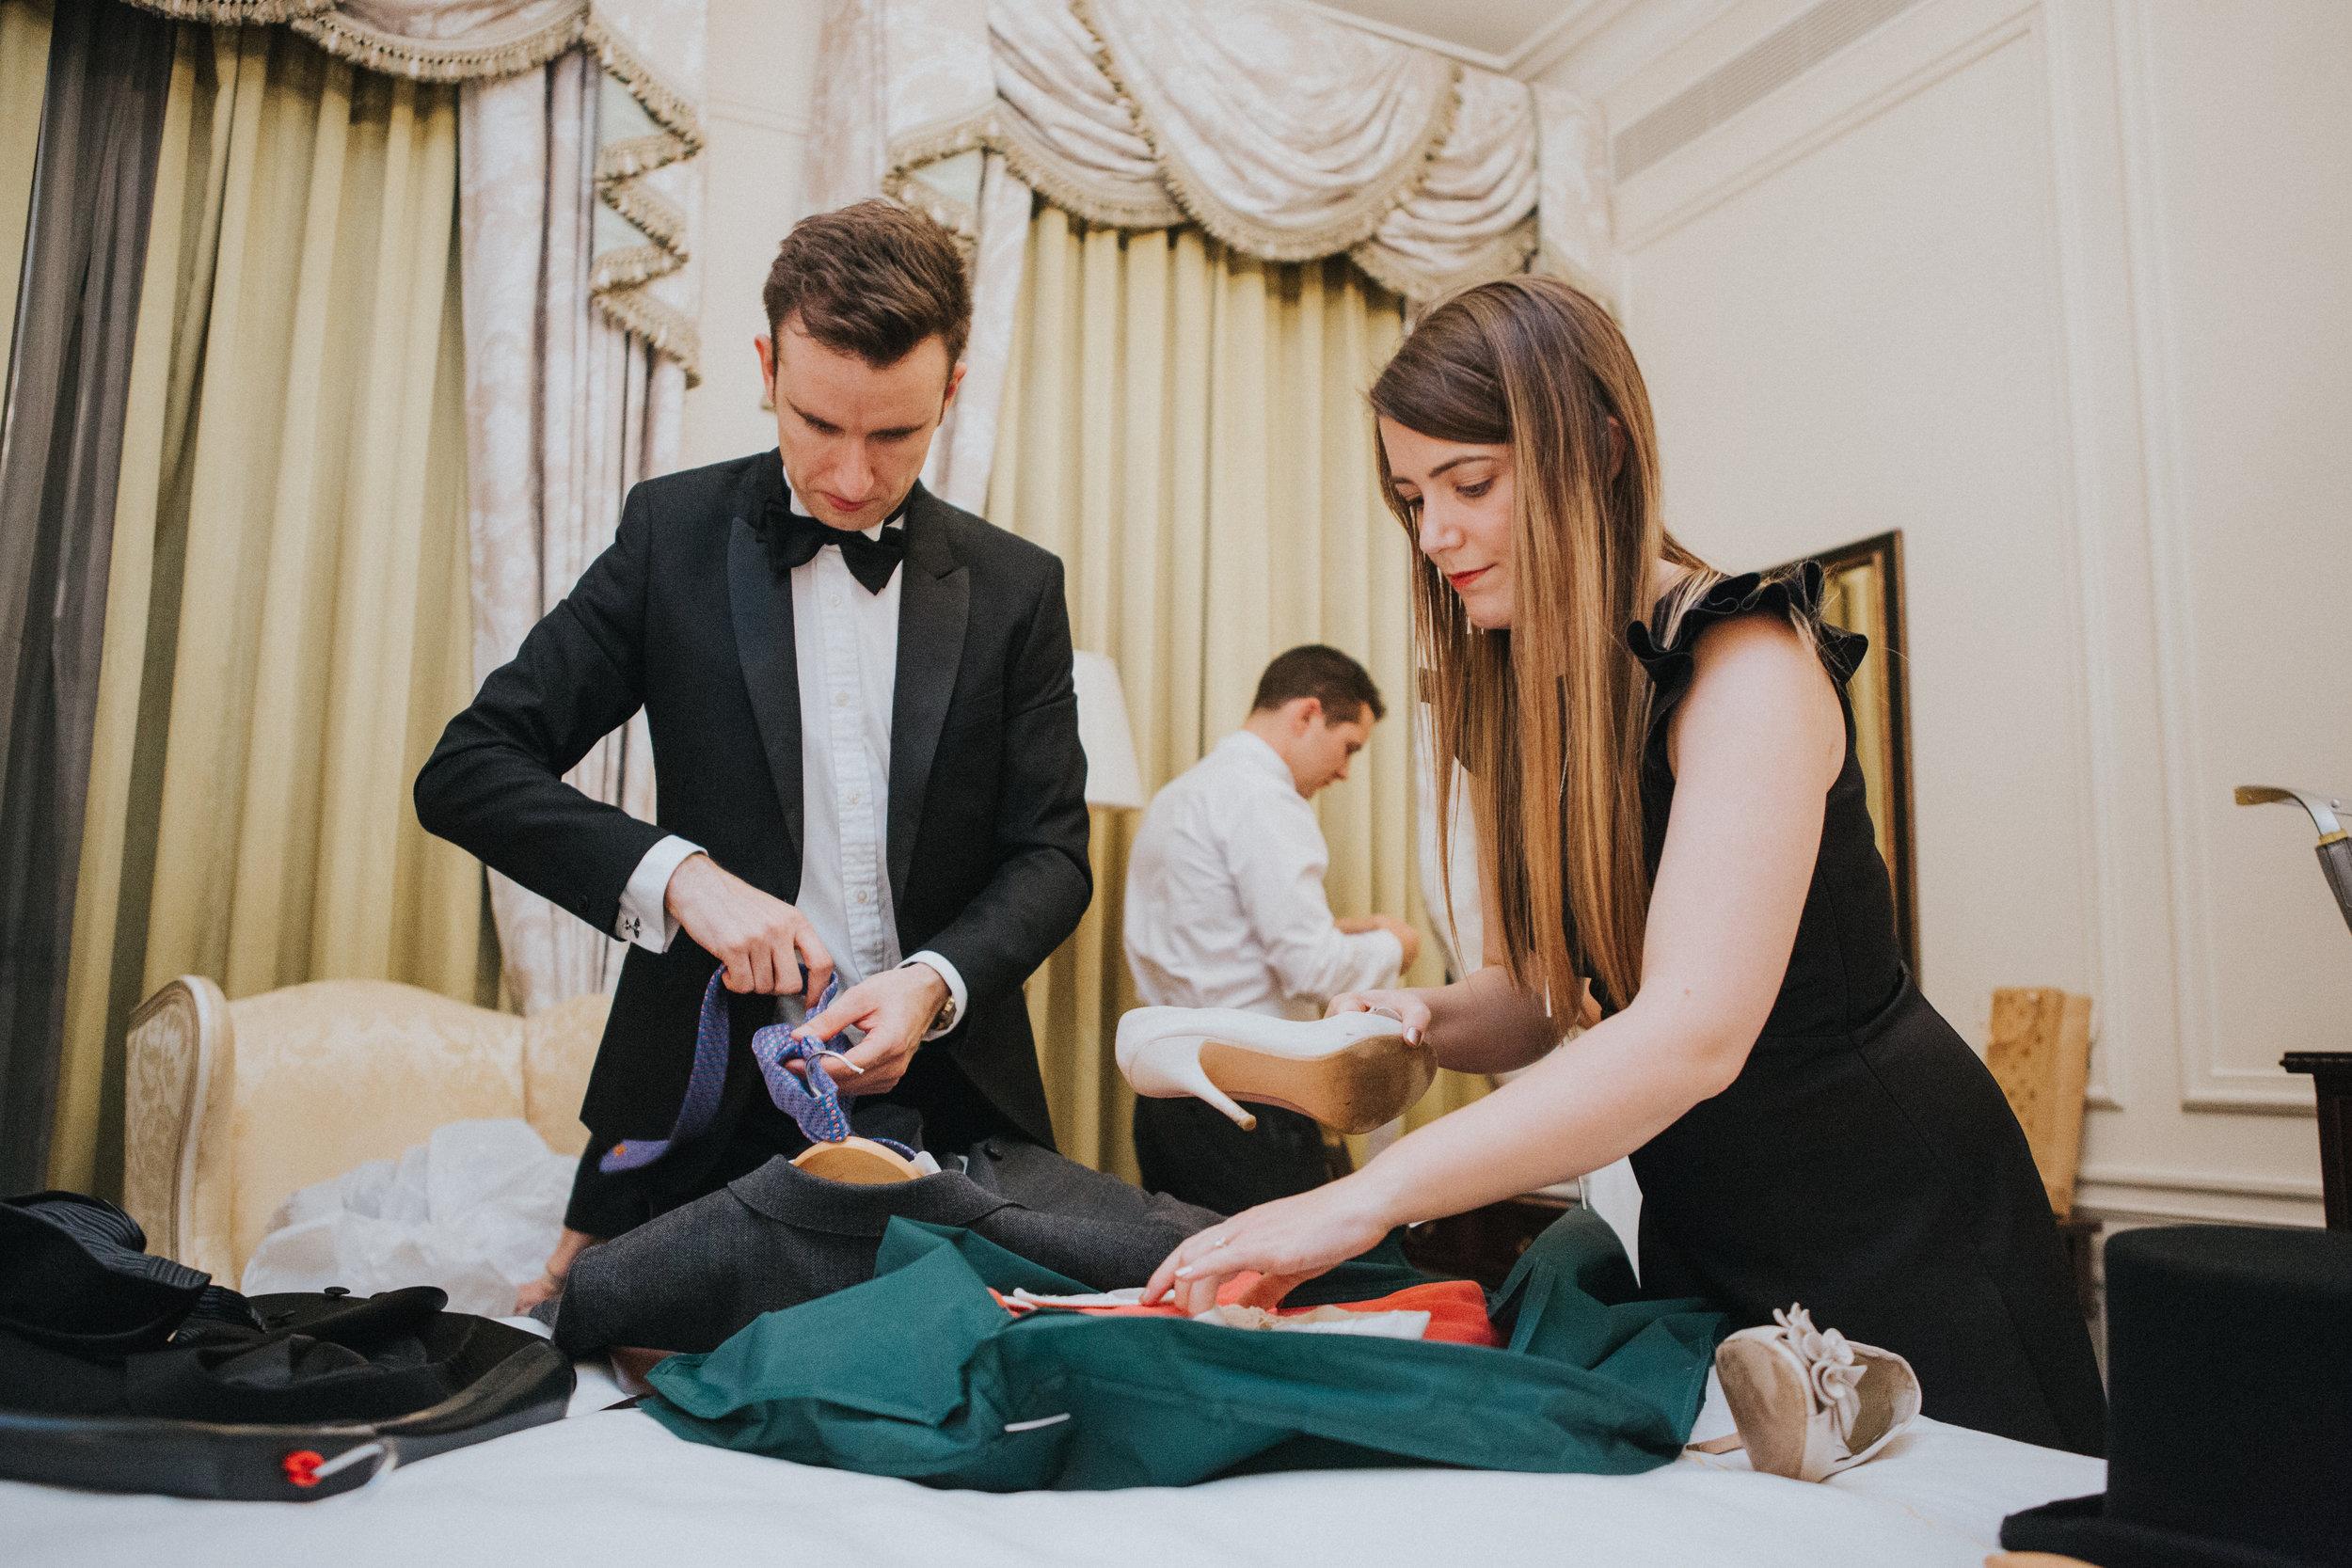 london-wedding-photography-wimbledon-wandsworth-town-hall-savoy-hotel-room-party-prep-chaos-92